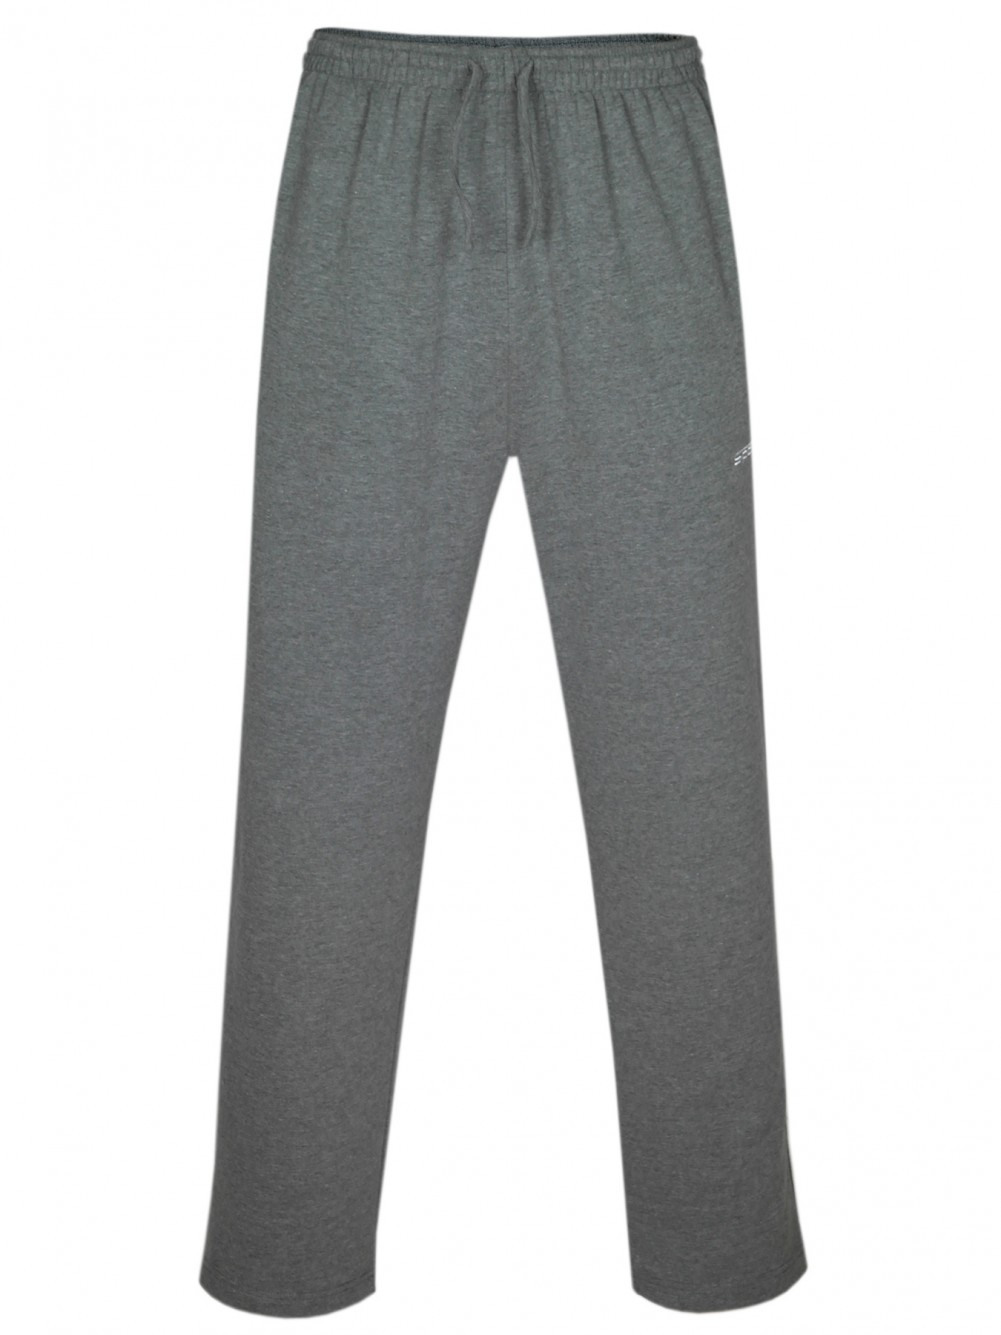 Baumwoll Herren Jogginghose offener Beinabschluss - Grau